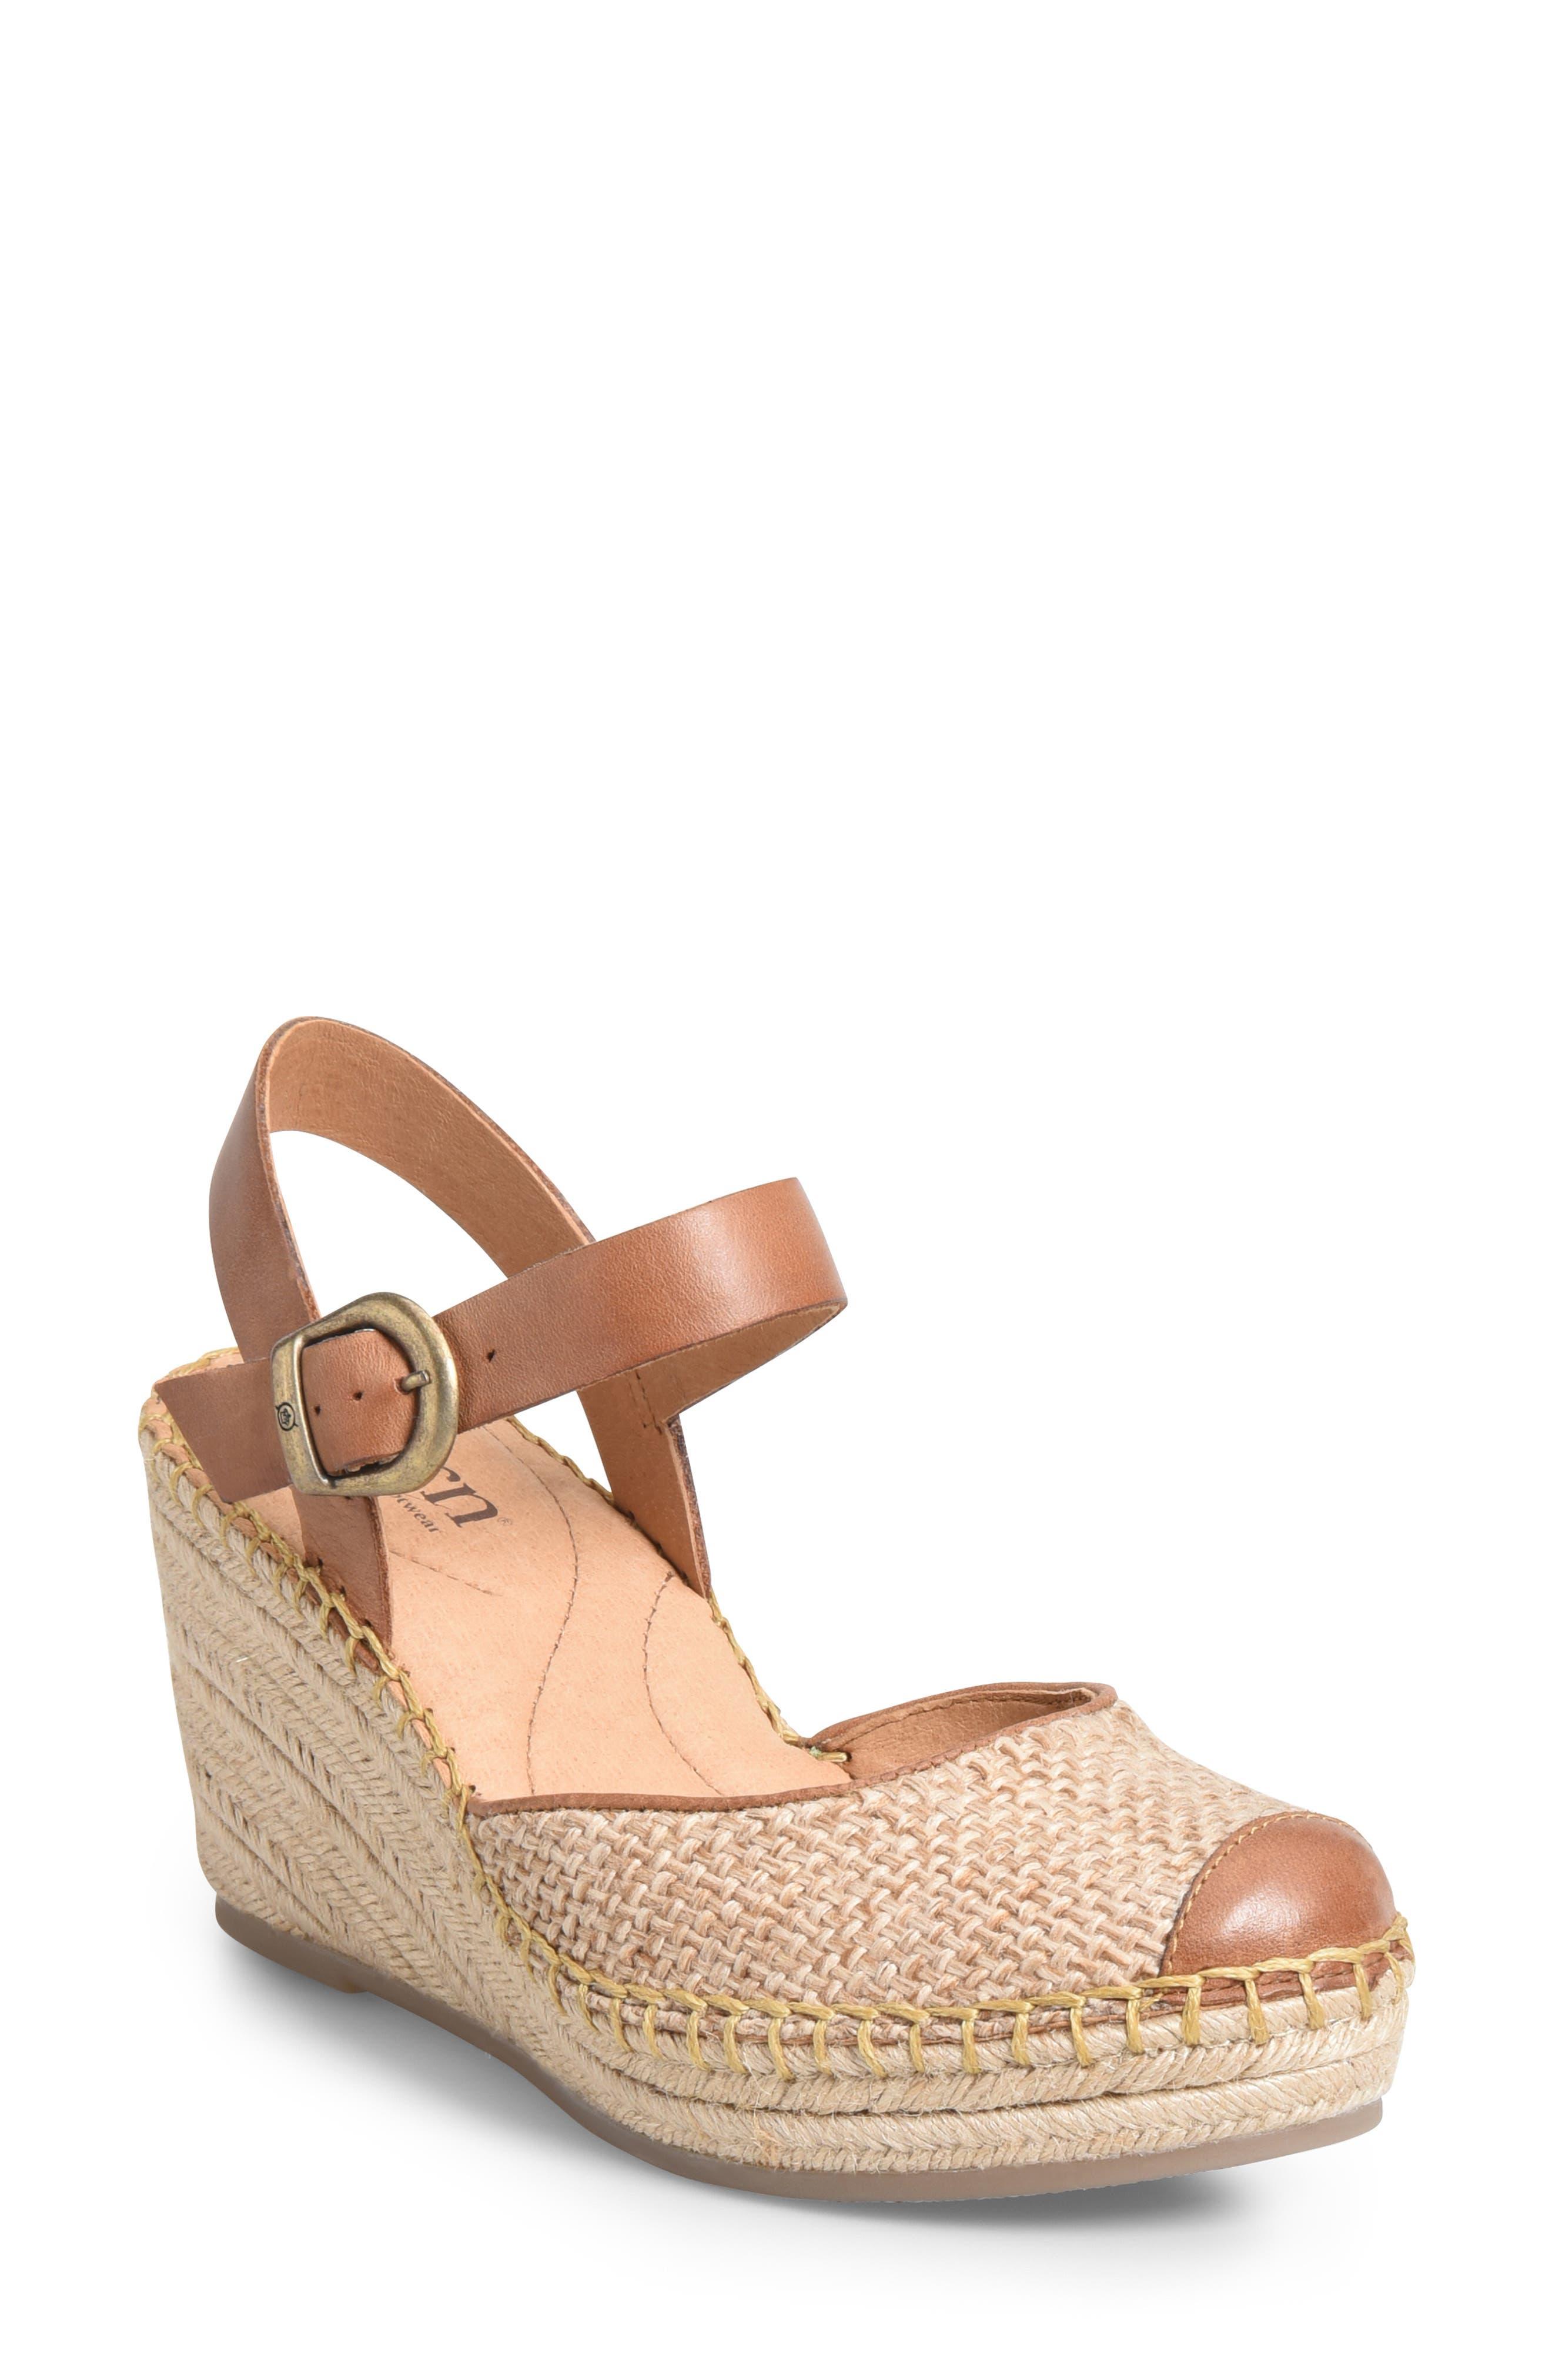 B?rn Guadalupe Wedge Sandal, Brown